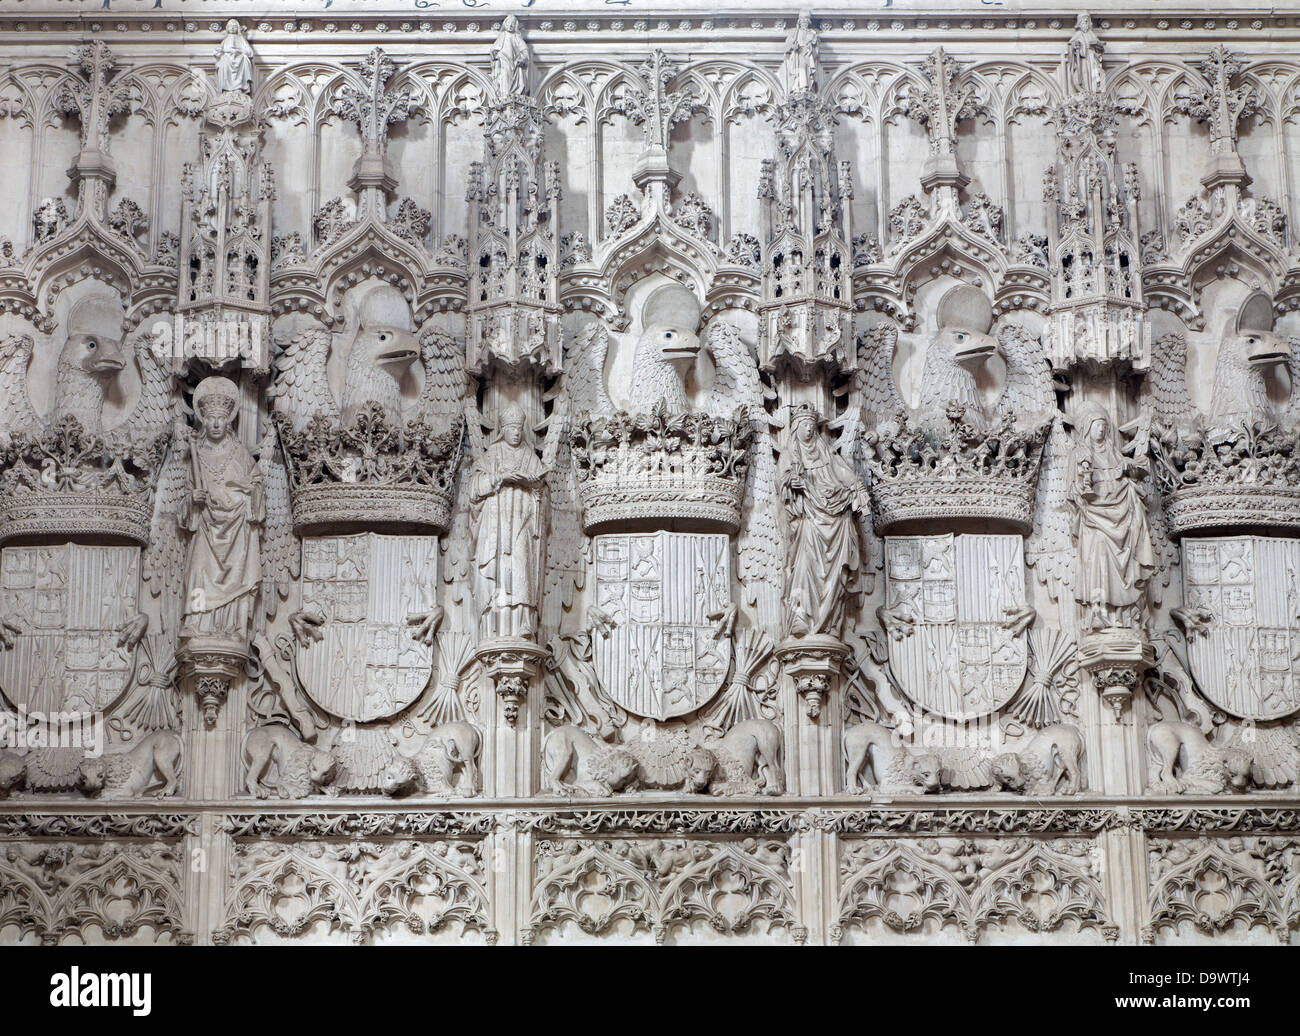 TOLEDO - MARCH 8: Detail of gothic interior of Monasterio San Juan de los Reyes or Monastery of Saint John of the - Stock Image